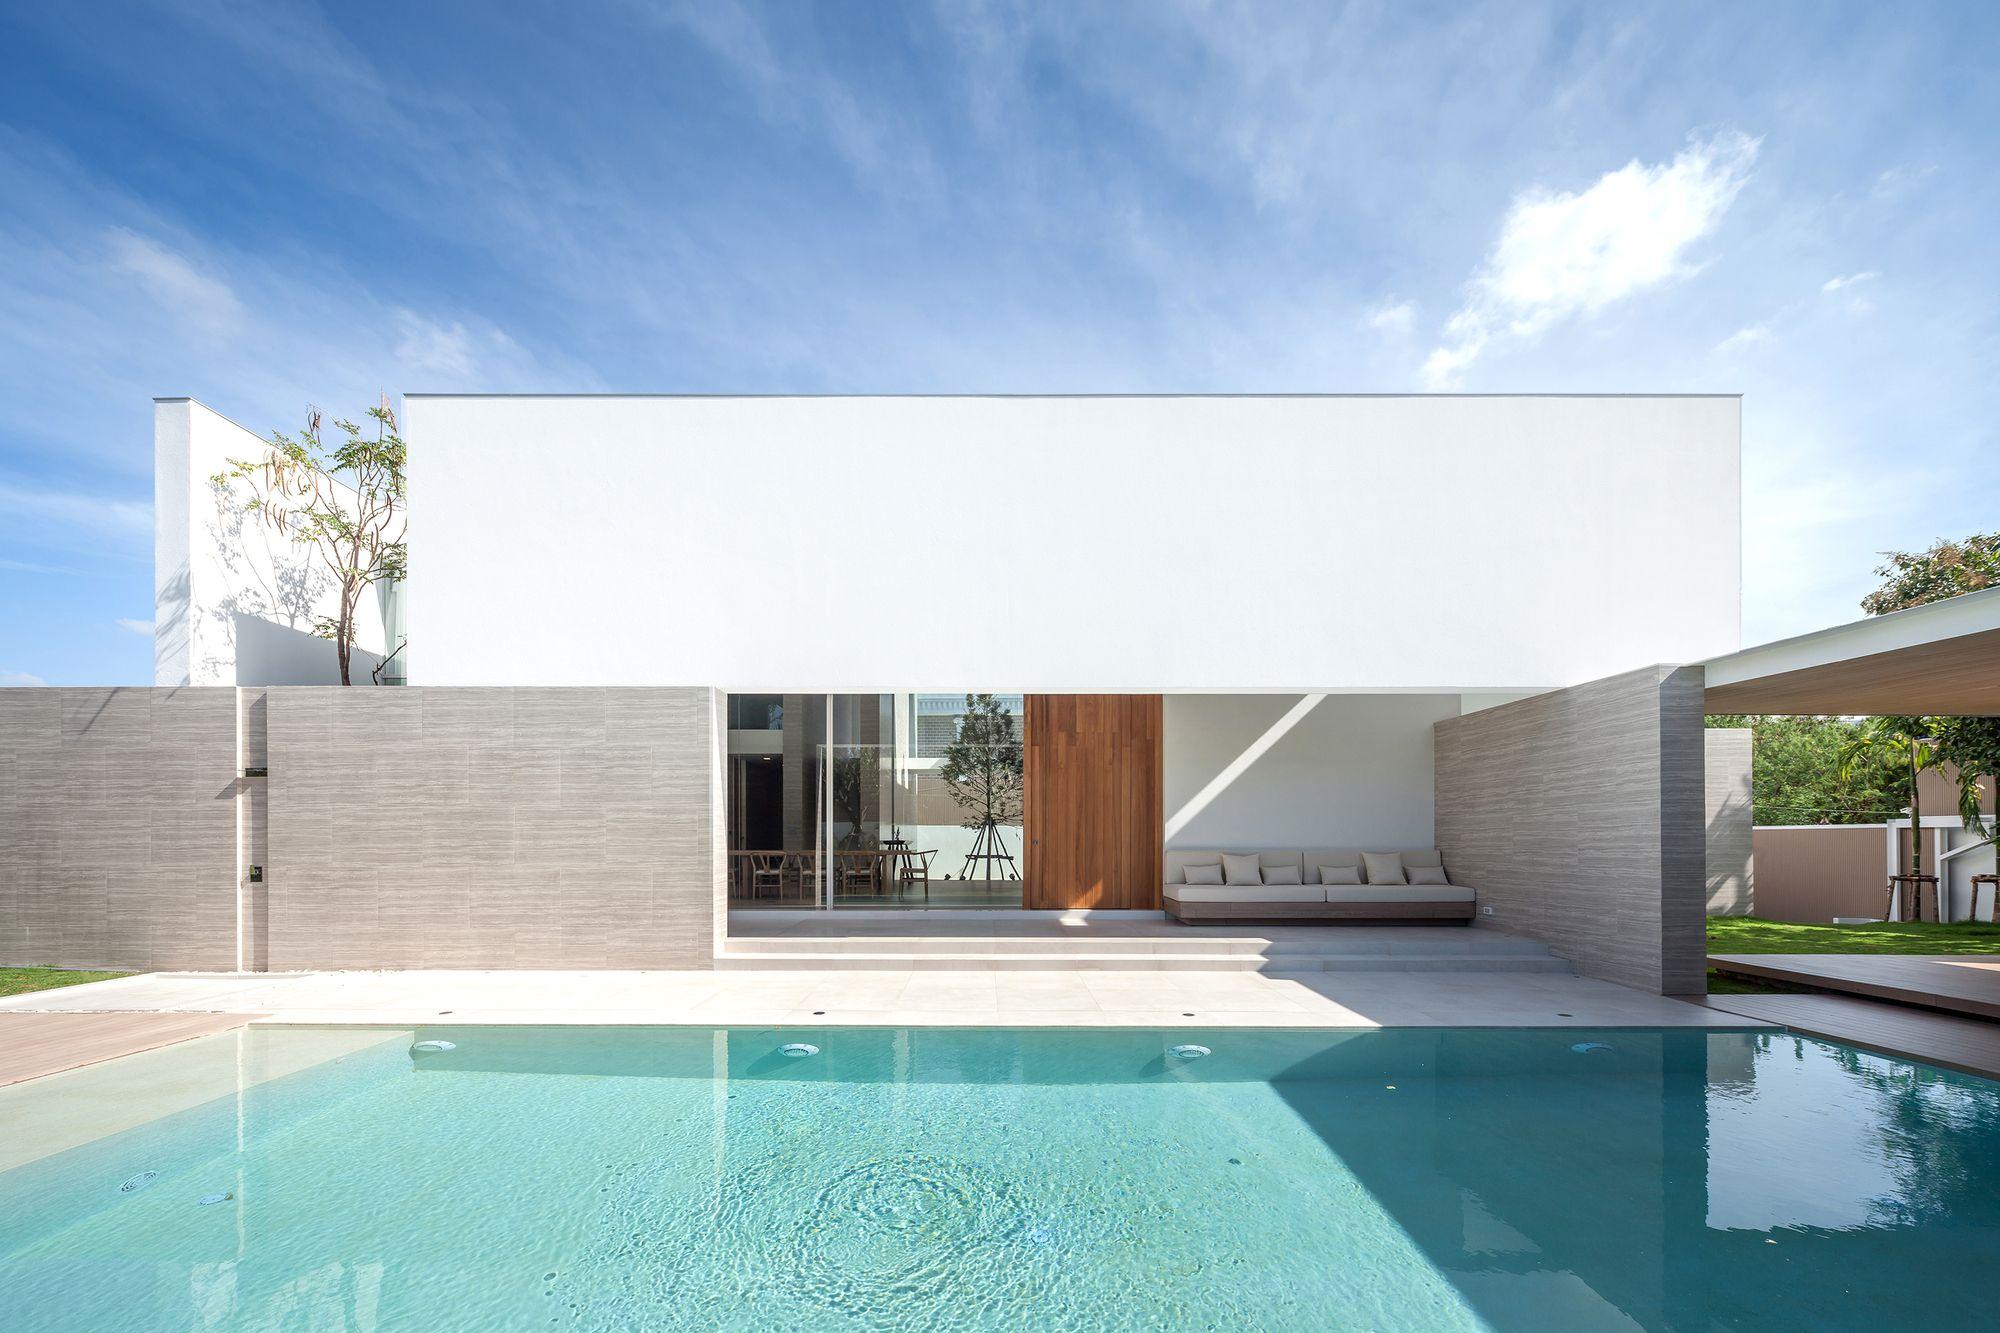 pa house idin architects arch daily minimalist house design rh pinterest co uk